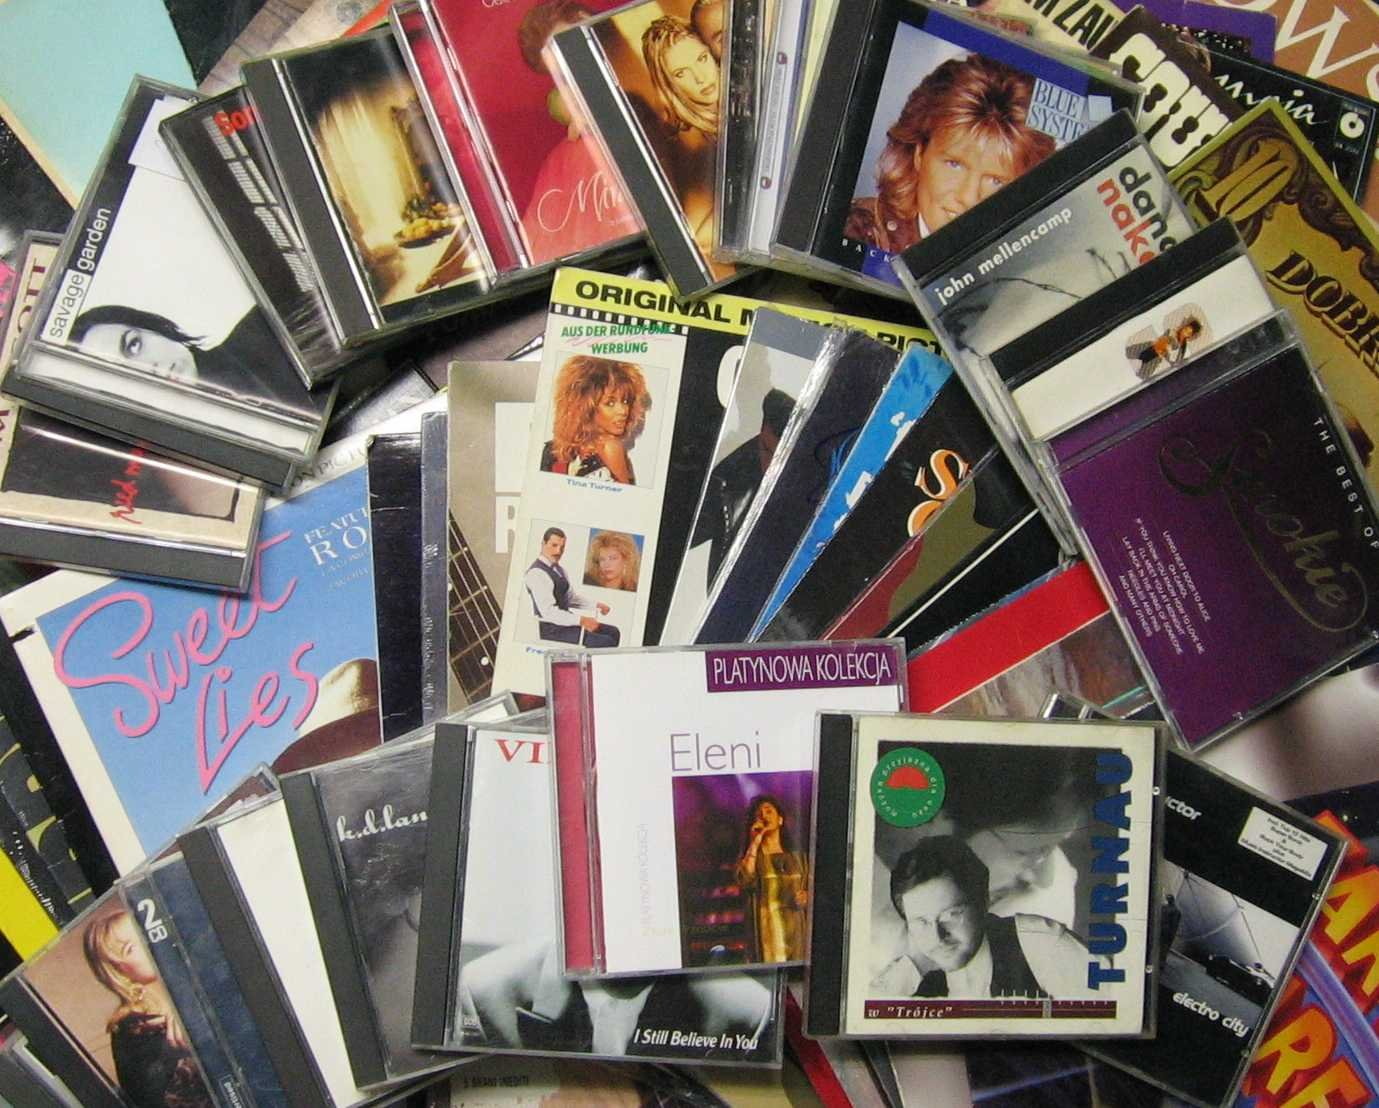 Kupię - płyty LP winylowe, CD kompaktowe, kasety magnetofonowe - Opole